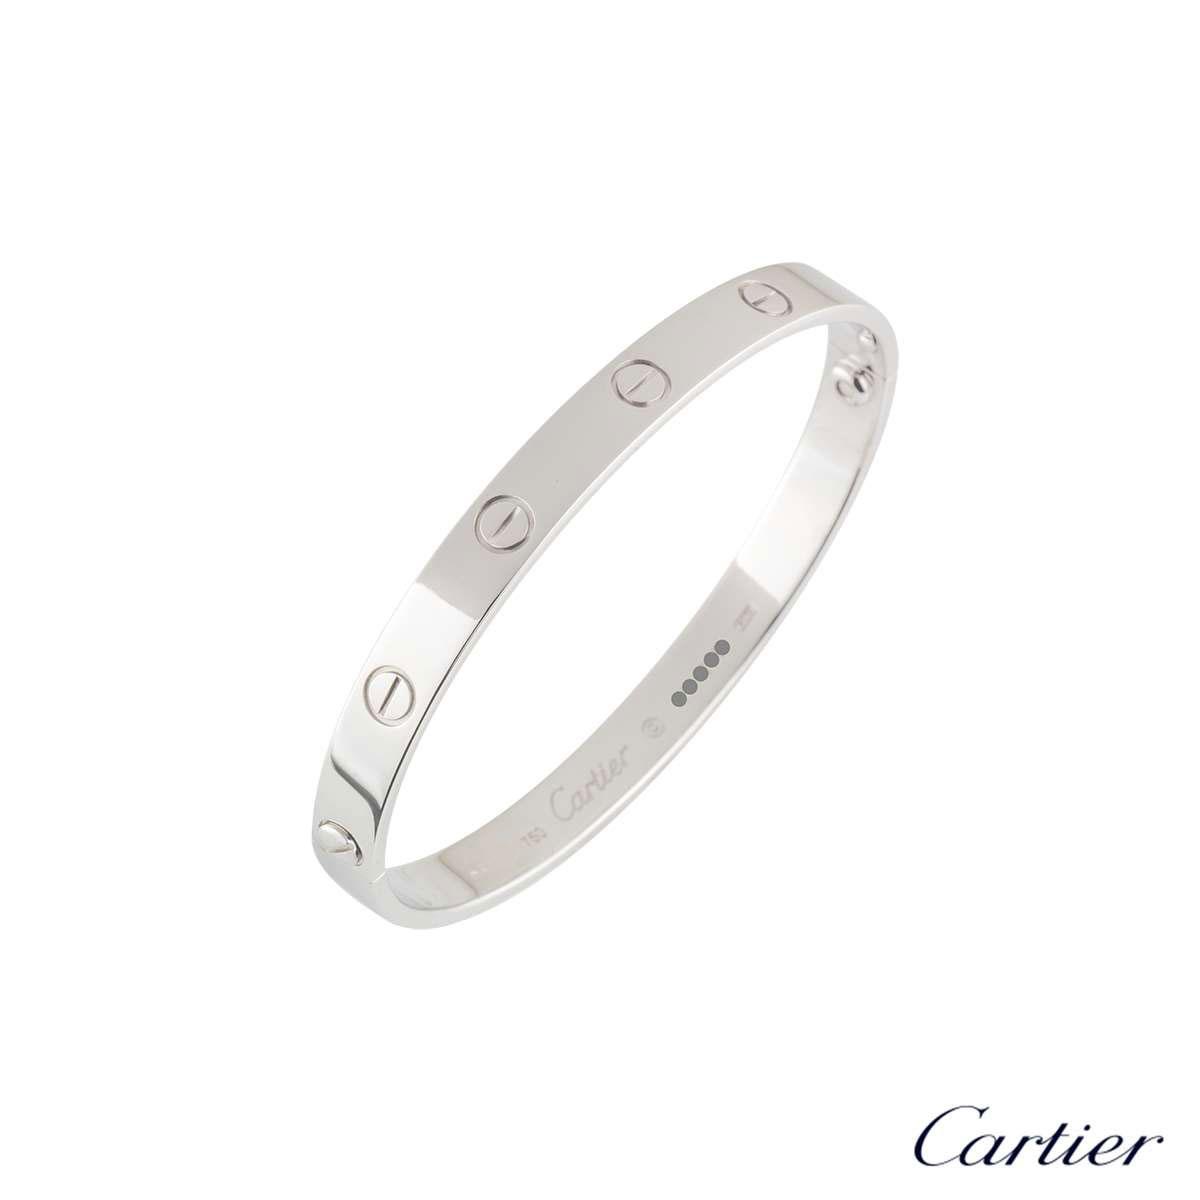 CartierWhite Gold Plain Love BraceletSize 20B6035420